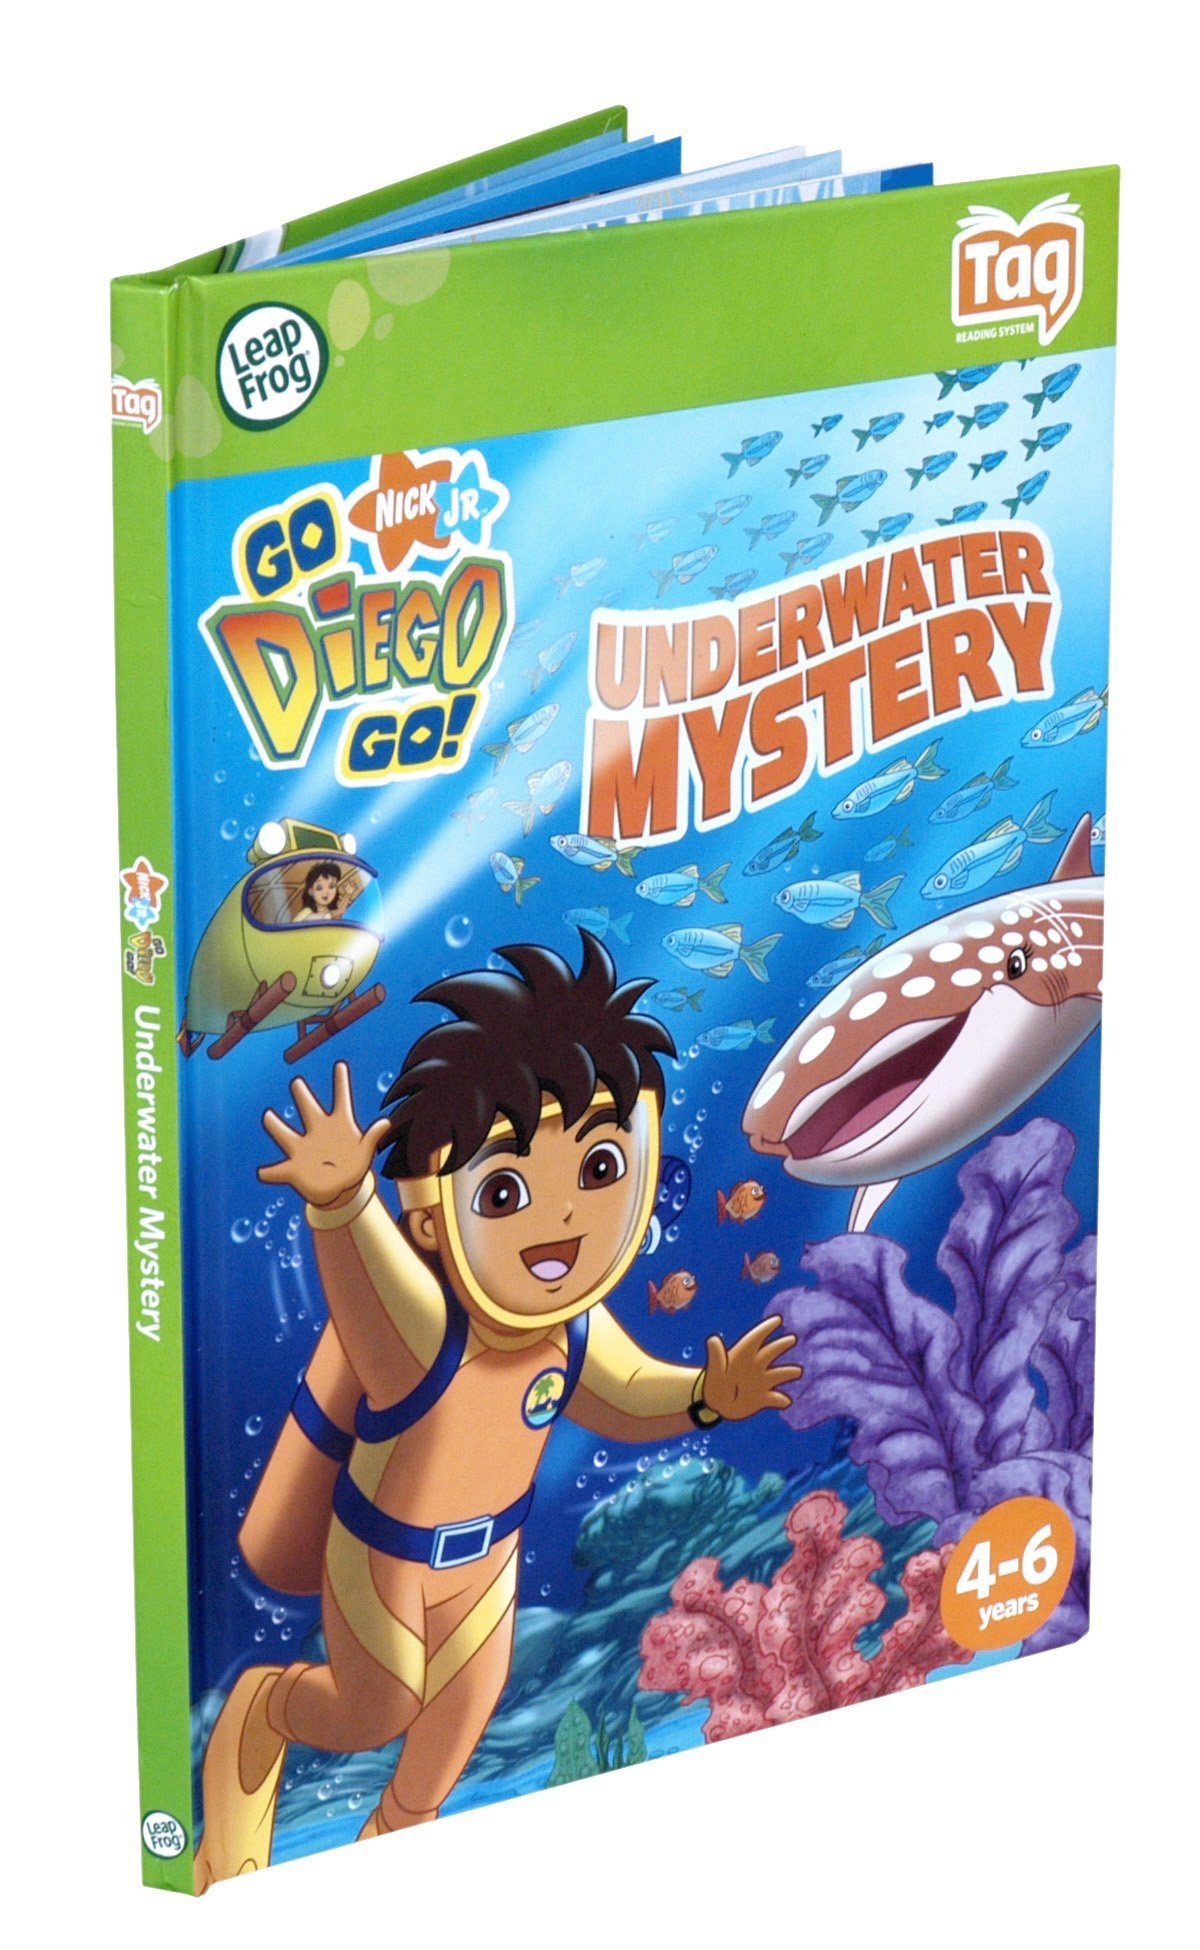 Leapfrog Tag Activity Storybook Go Diego Go!: Underwater Mystery